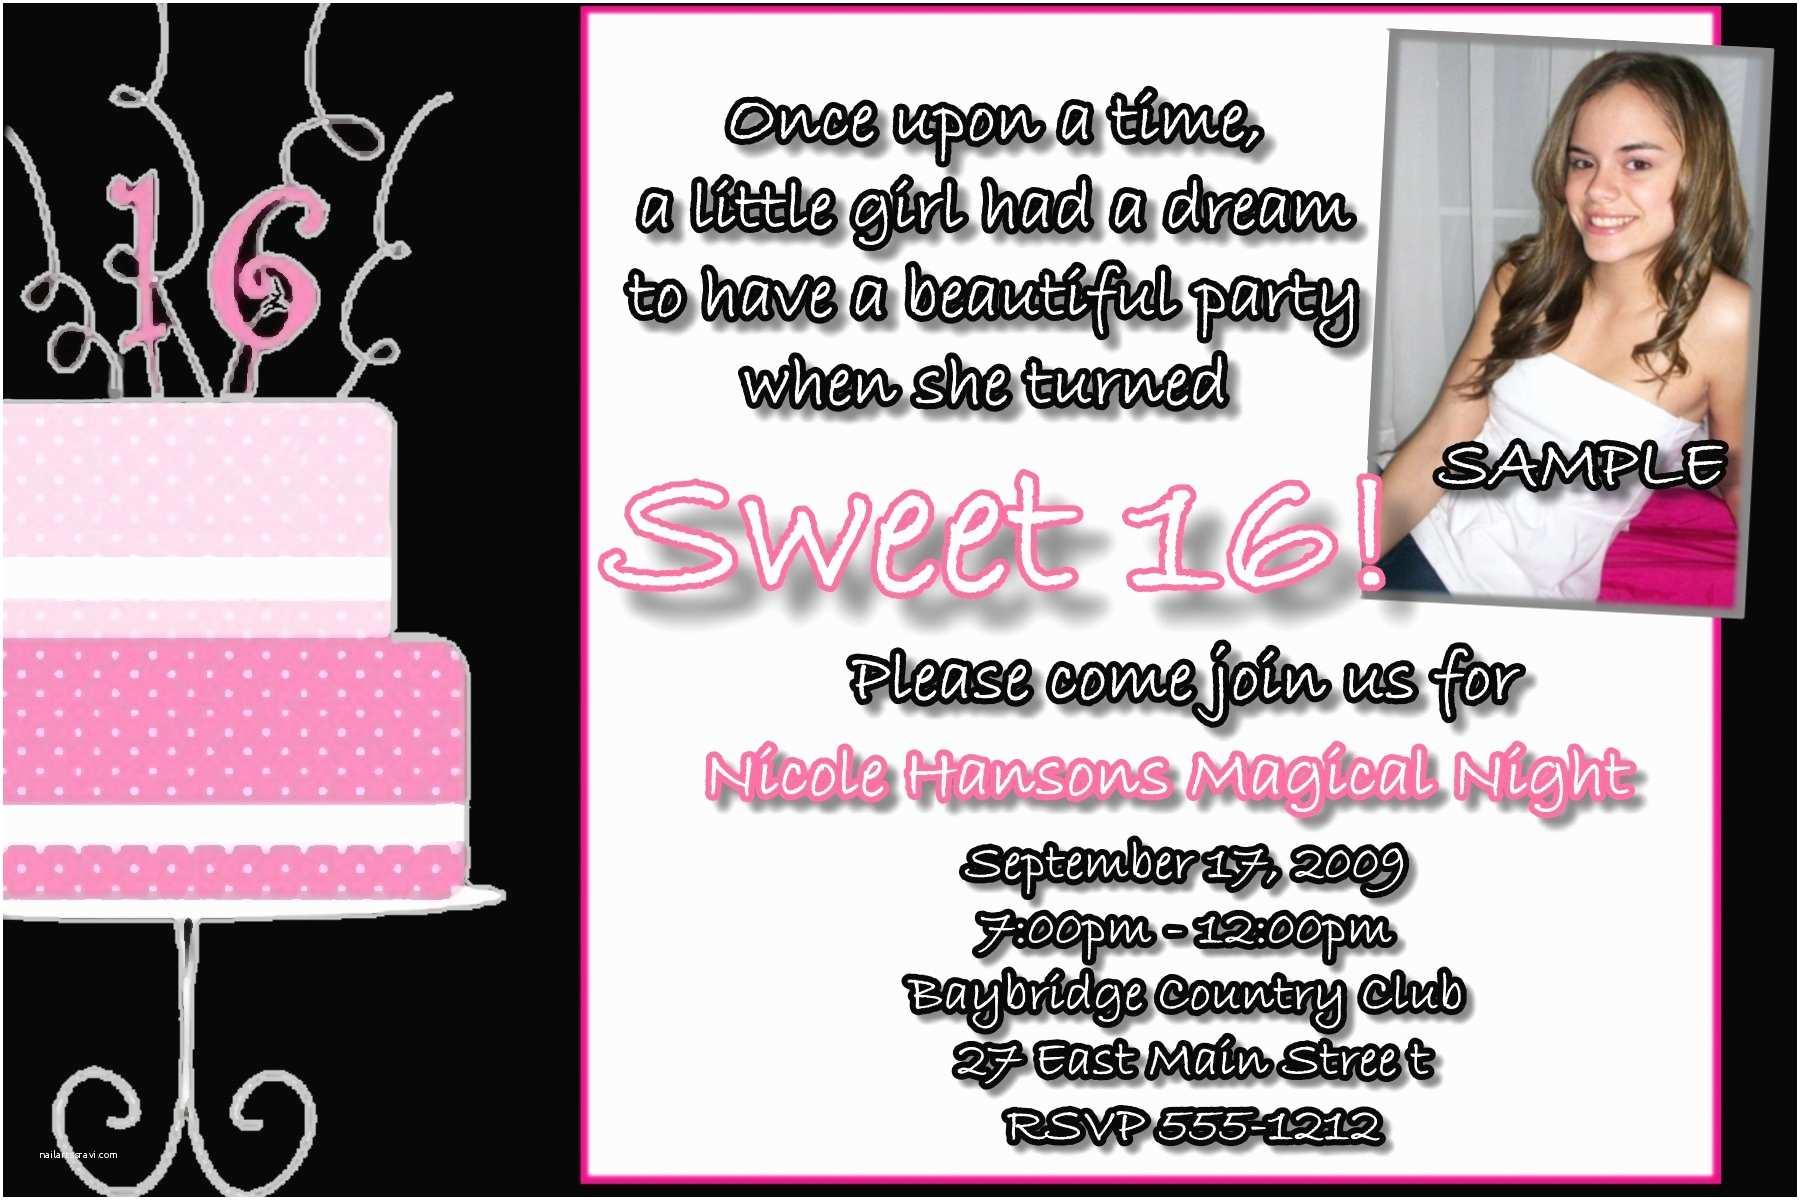 16th Birthday Party Invitations Sweet Sixteen Invitation Wording Template Resume Builder